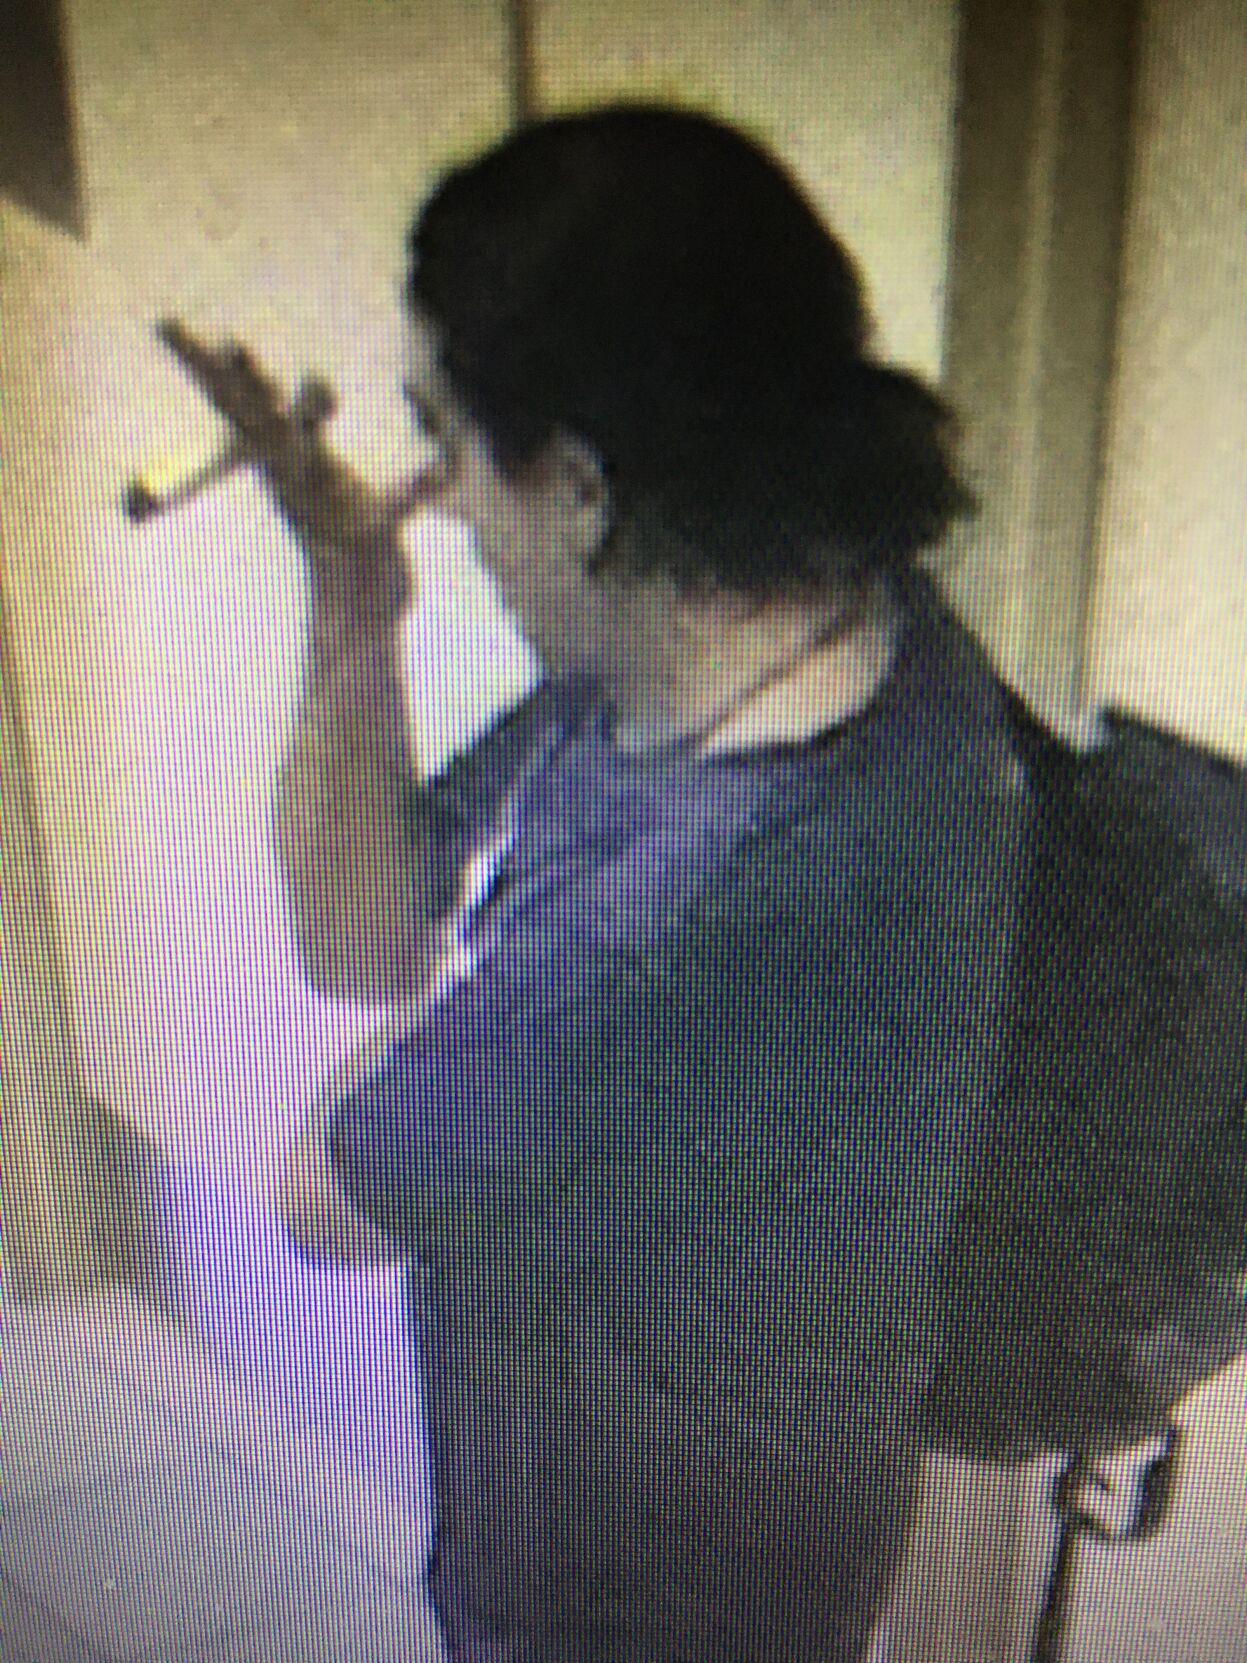 Vandalism suspect.1.JPG